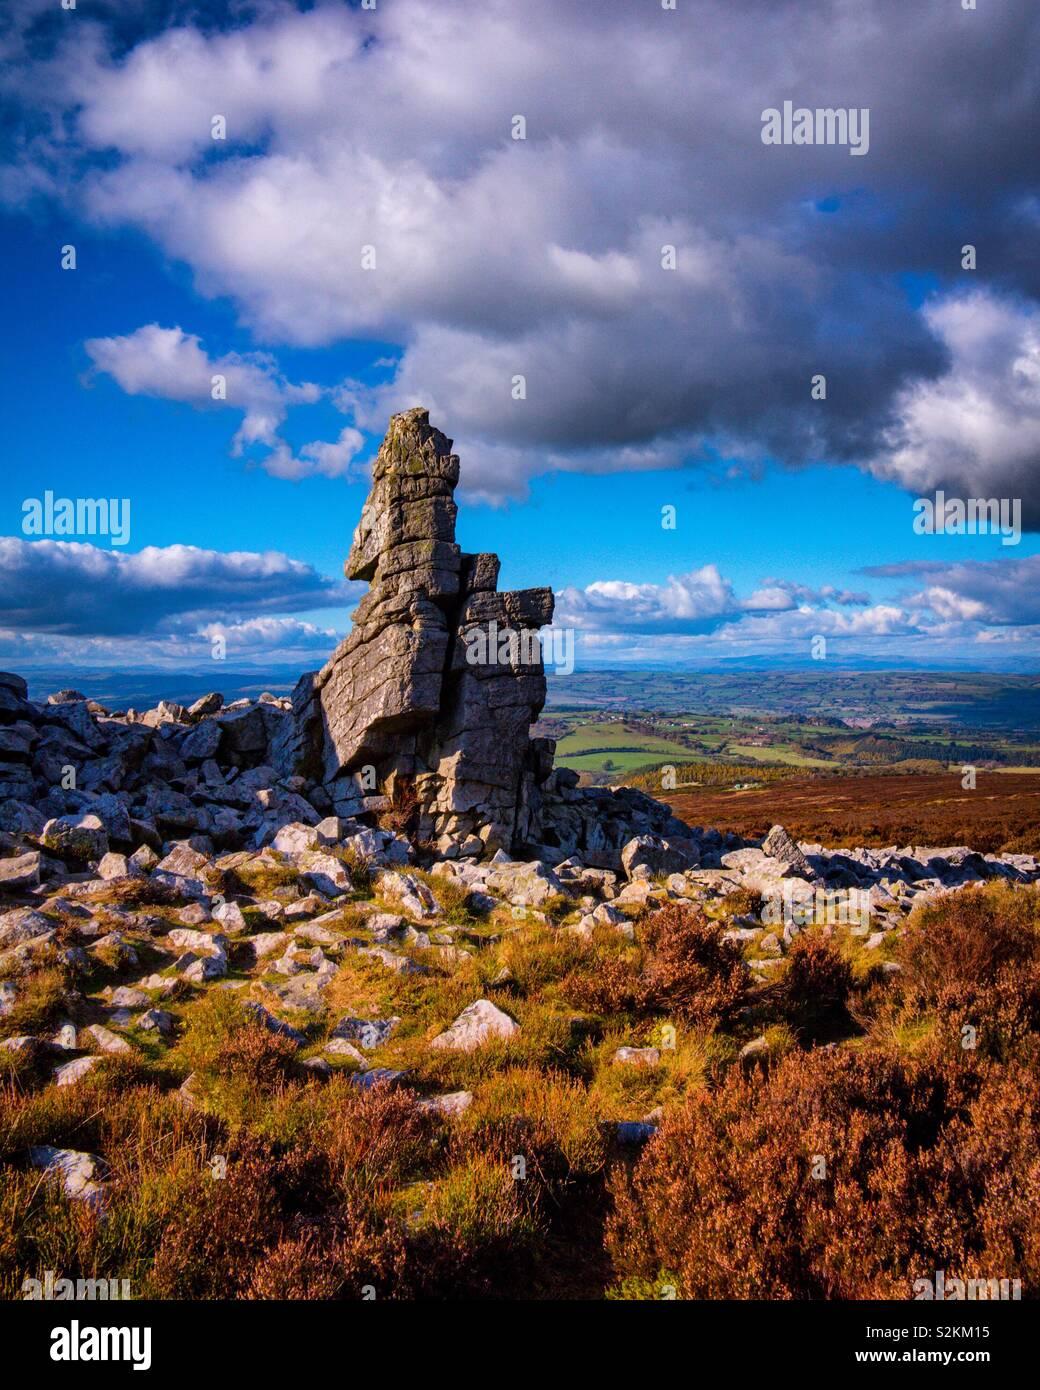 Les Stiperstones Rock formation dans le Shropshire Hills England UK Photo Stock